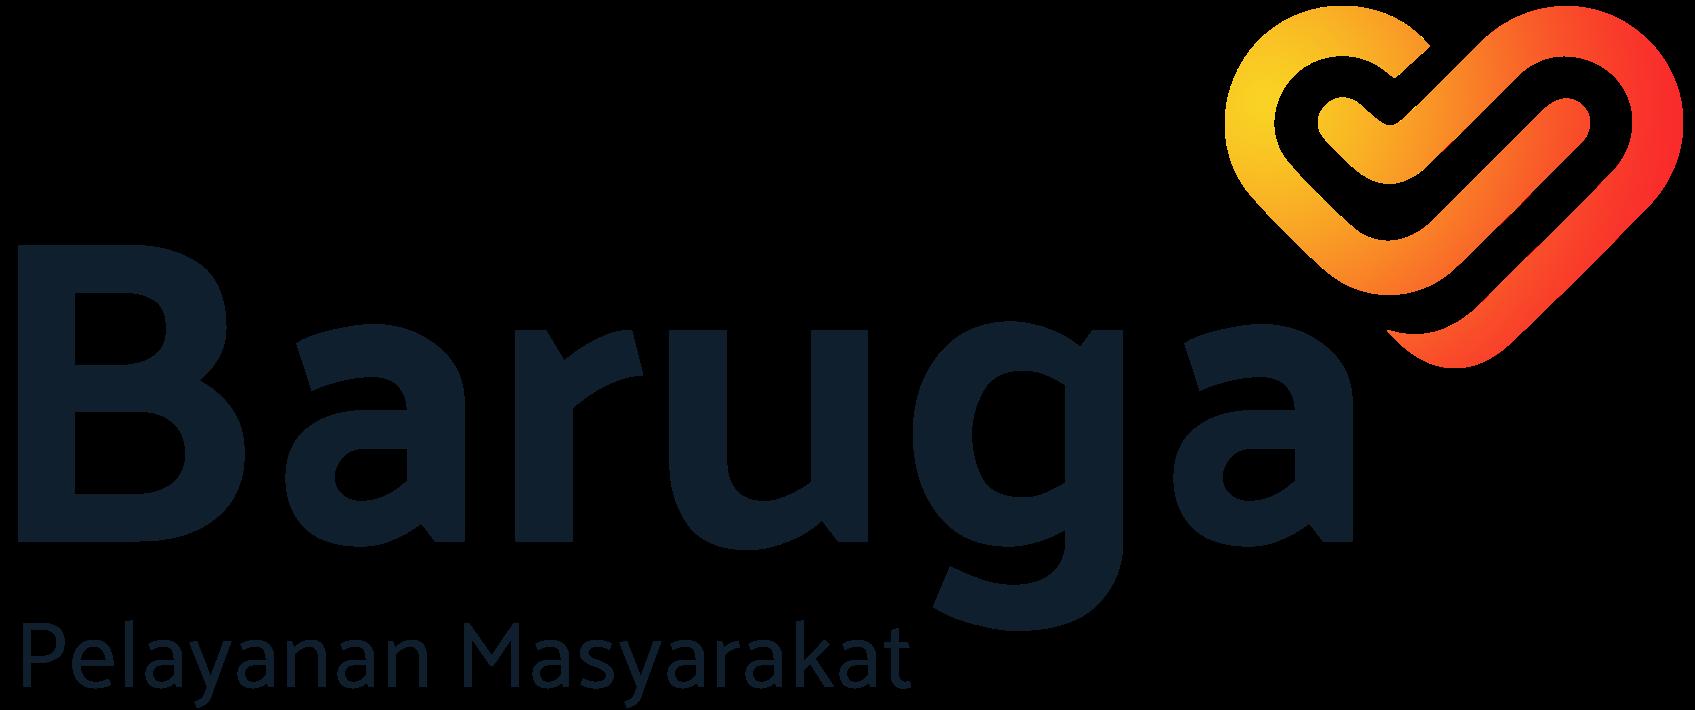 Sekretariat Daerah Pemda Kabupaten Enrekang